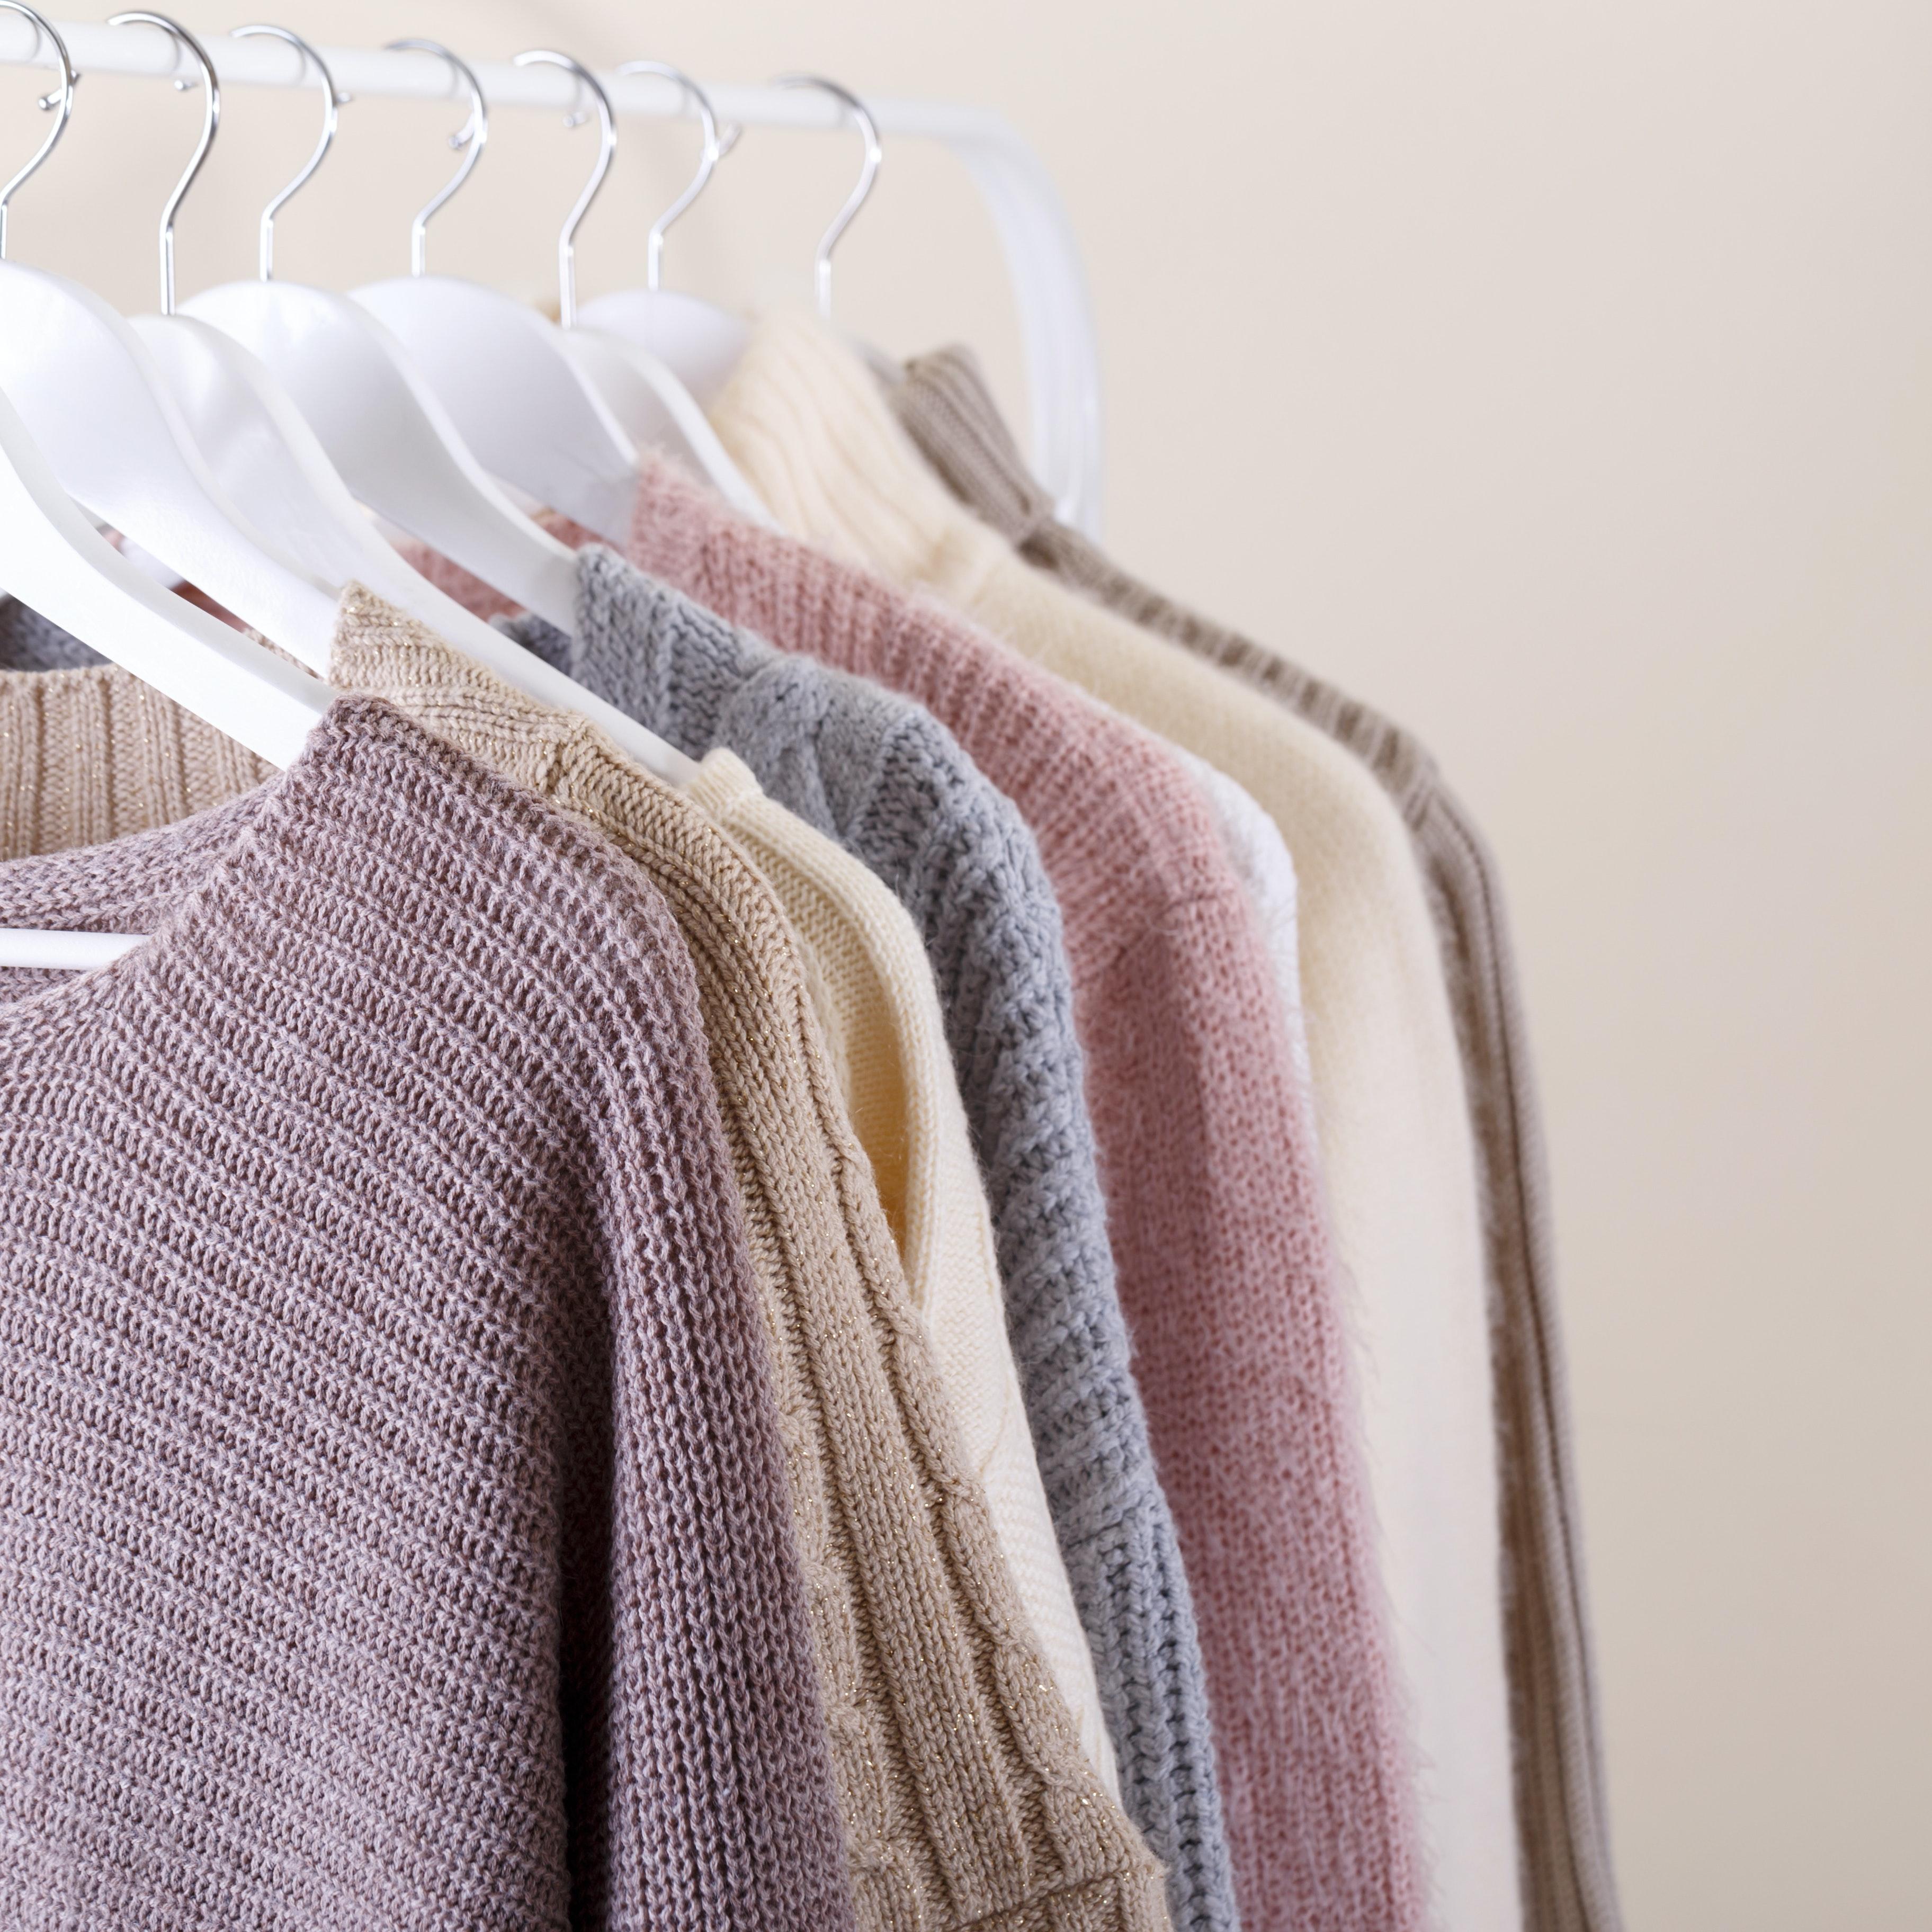 Se listen: Disse populære modebrands får mest kritik på sociale medier